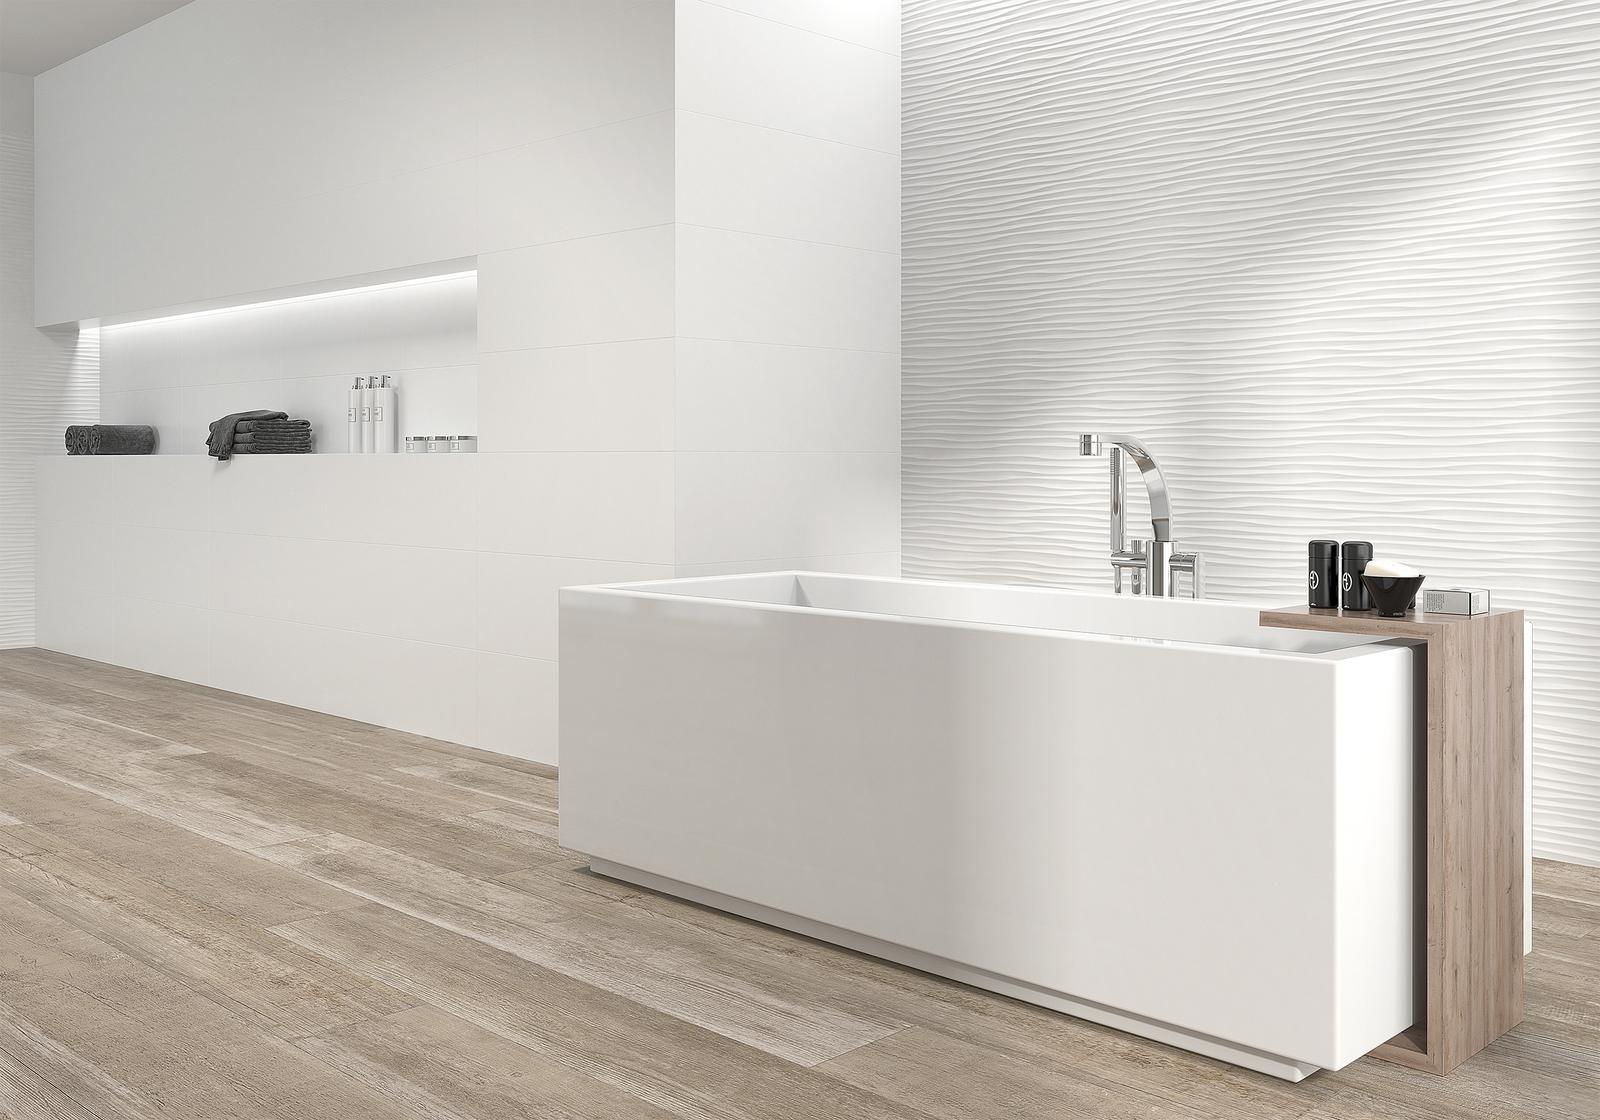 Moderné kúpeľne - moderná kúpeľňa s imitáciou dreva Luminor Blanco 29x89